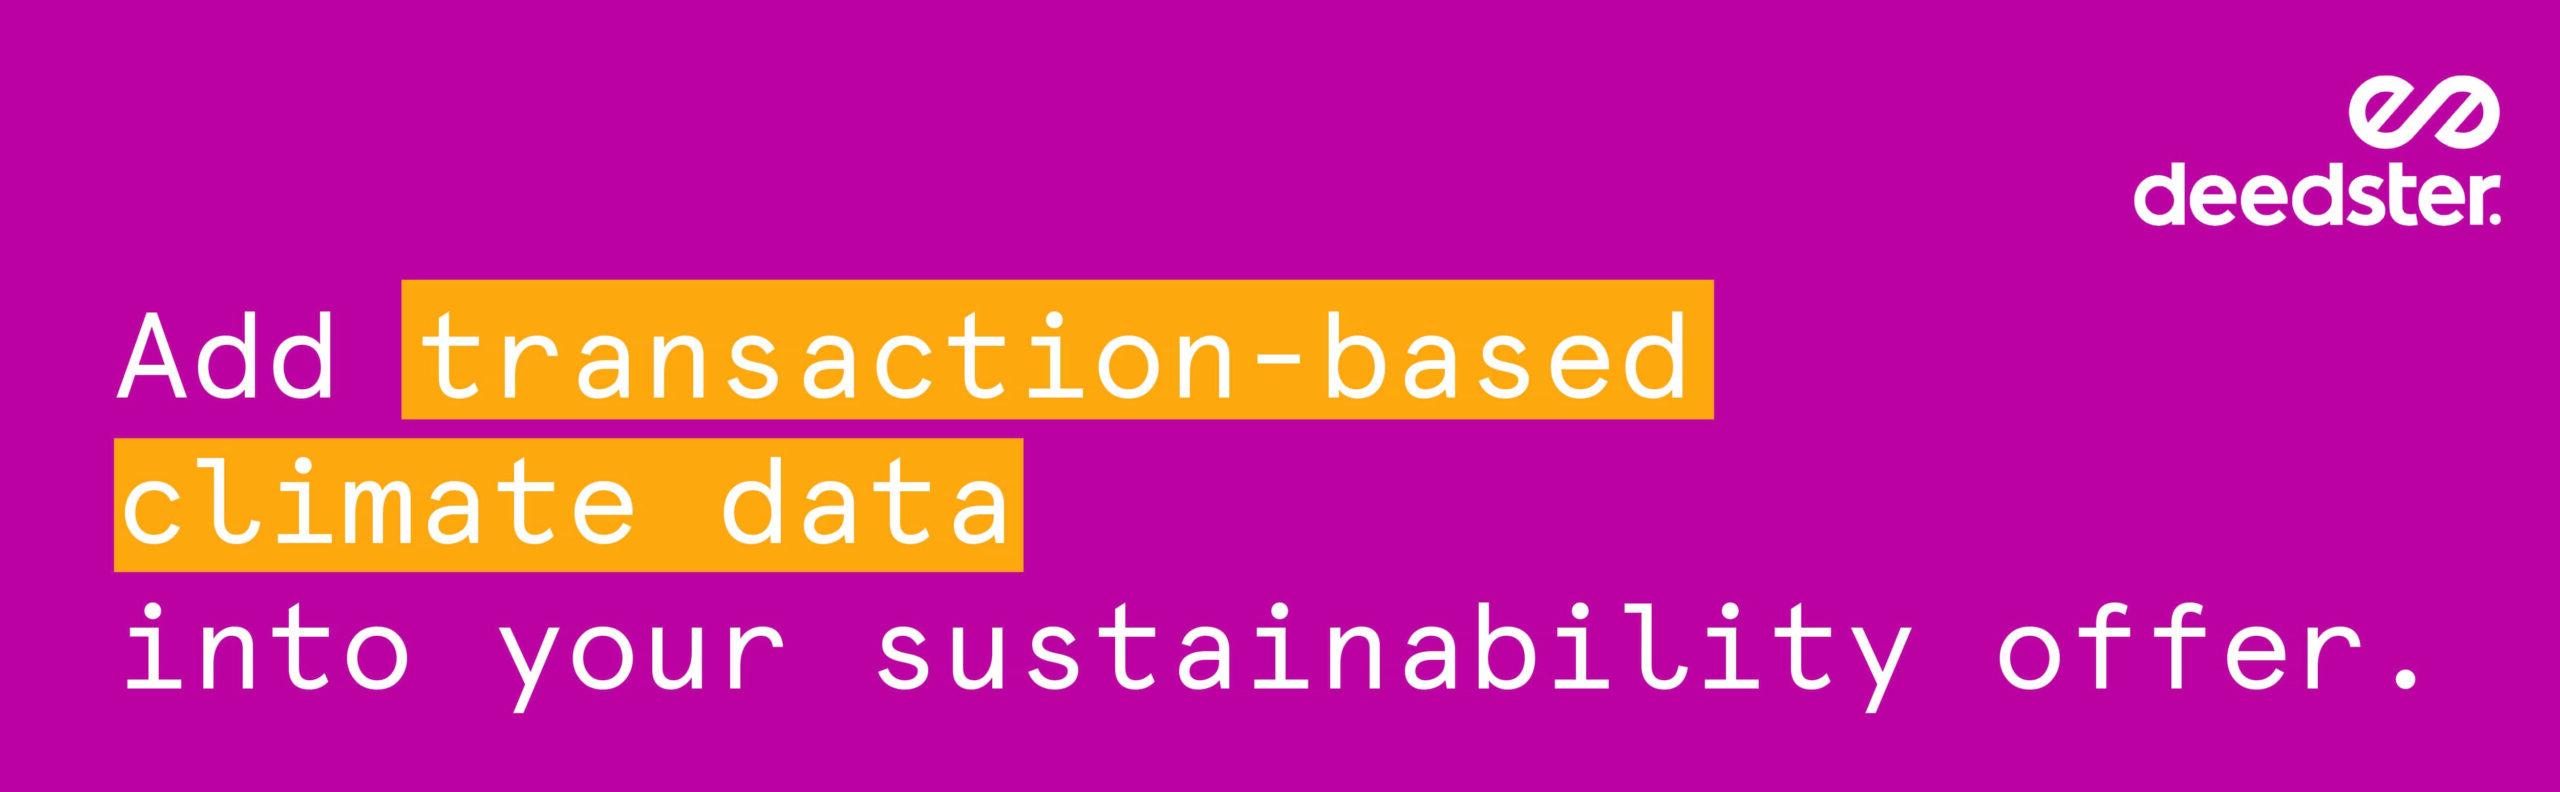 Transaction-based climate data